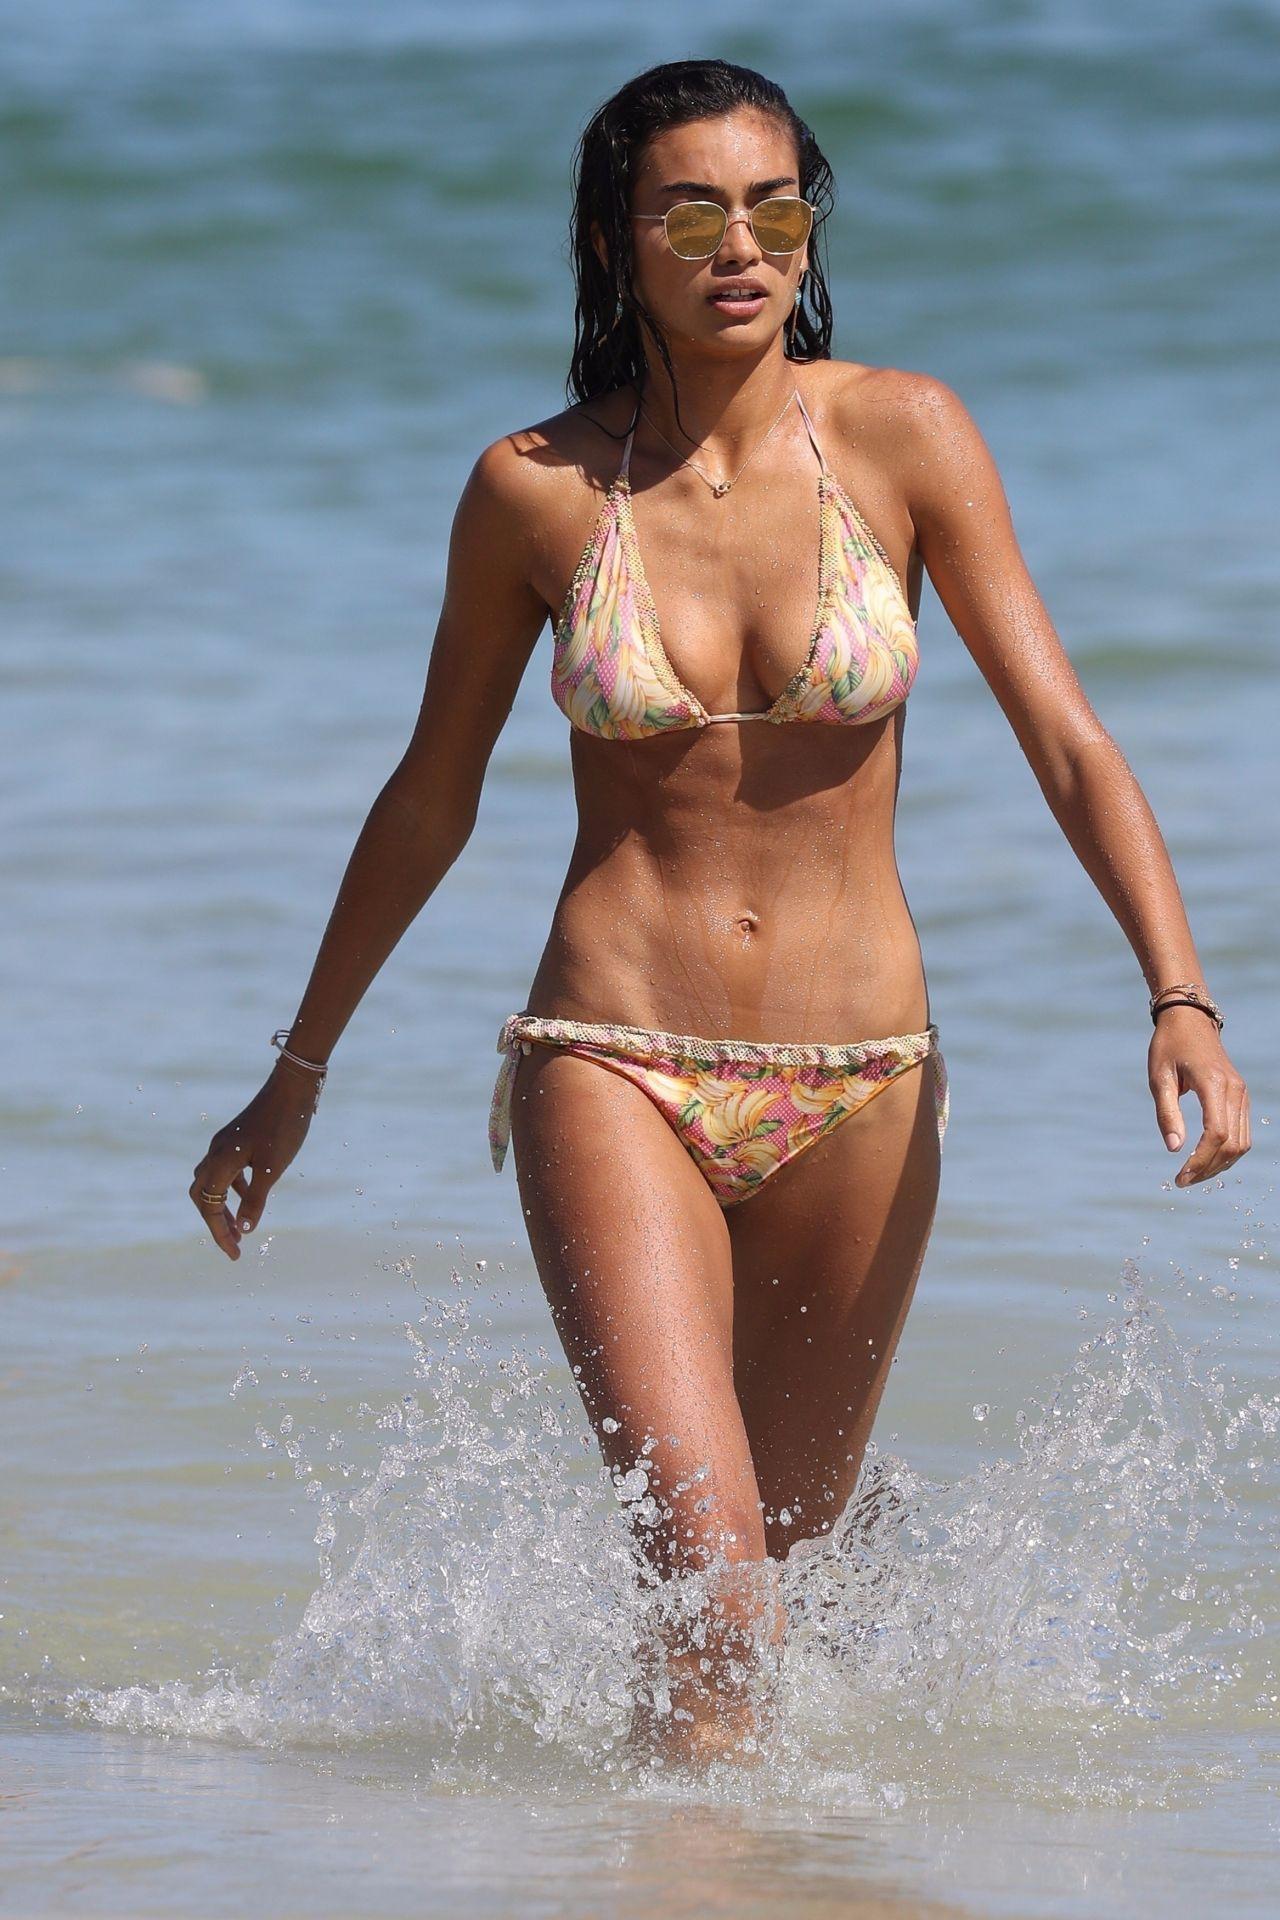 Kelly Gale in Bikini on Bondi Beach in Sydney Pic 30 of 35